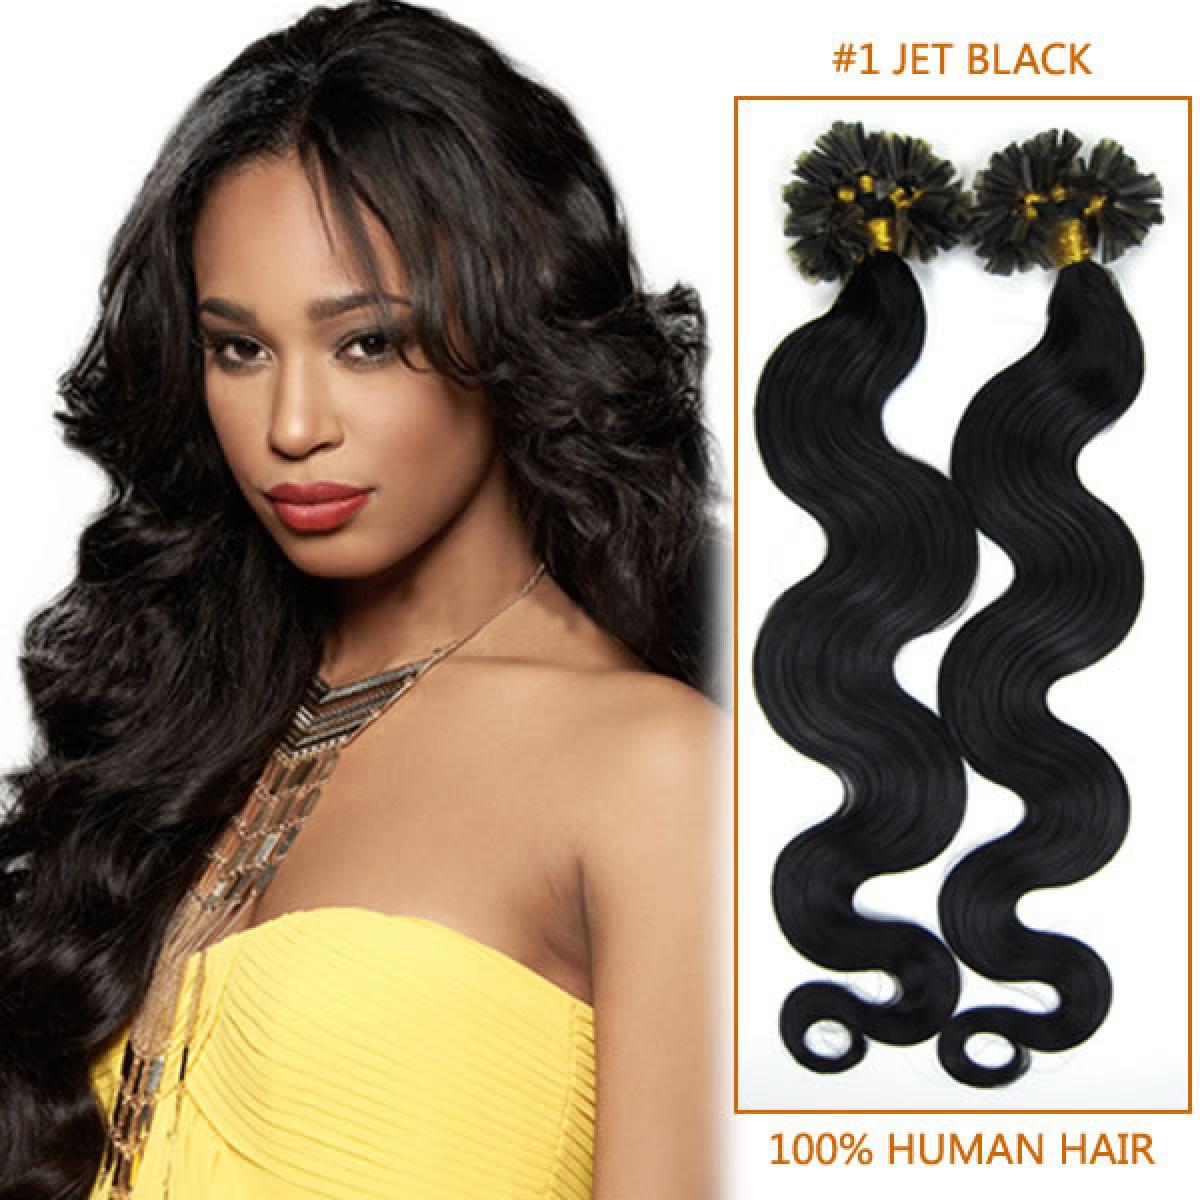 Inch 1 jet black wavy nail tip human hair extensions 100s 20 inch 1 jet black wavy nail tip human hair extensions 100s pmusecretfo Gallery